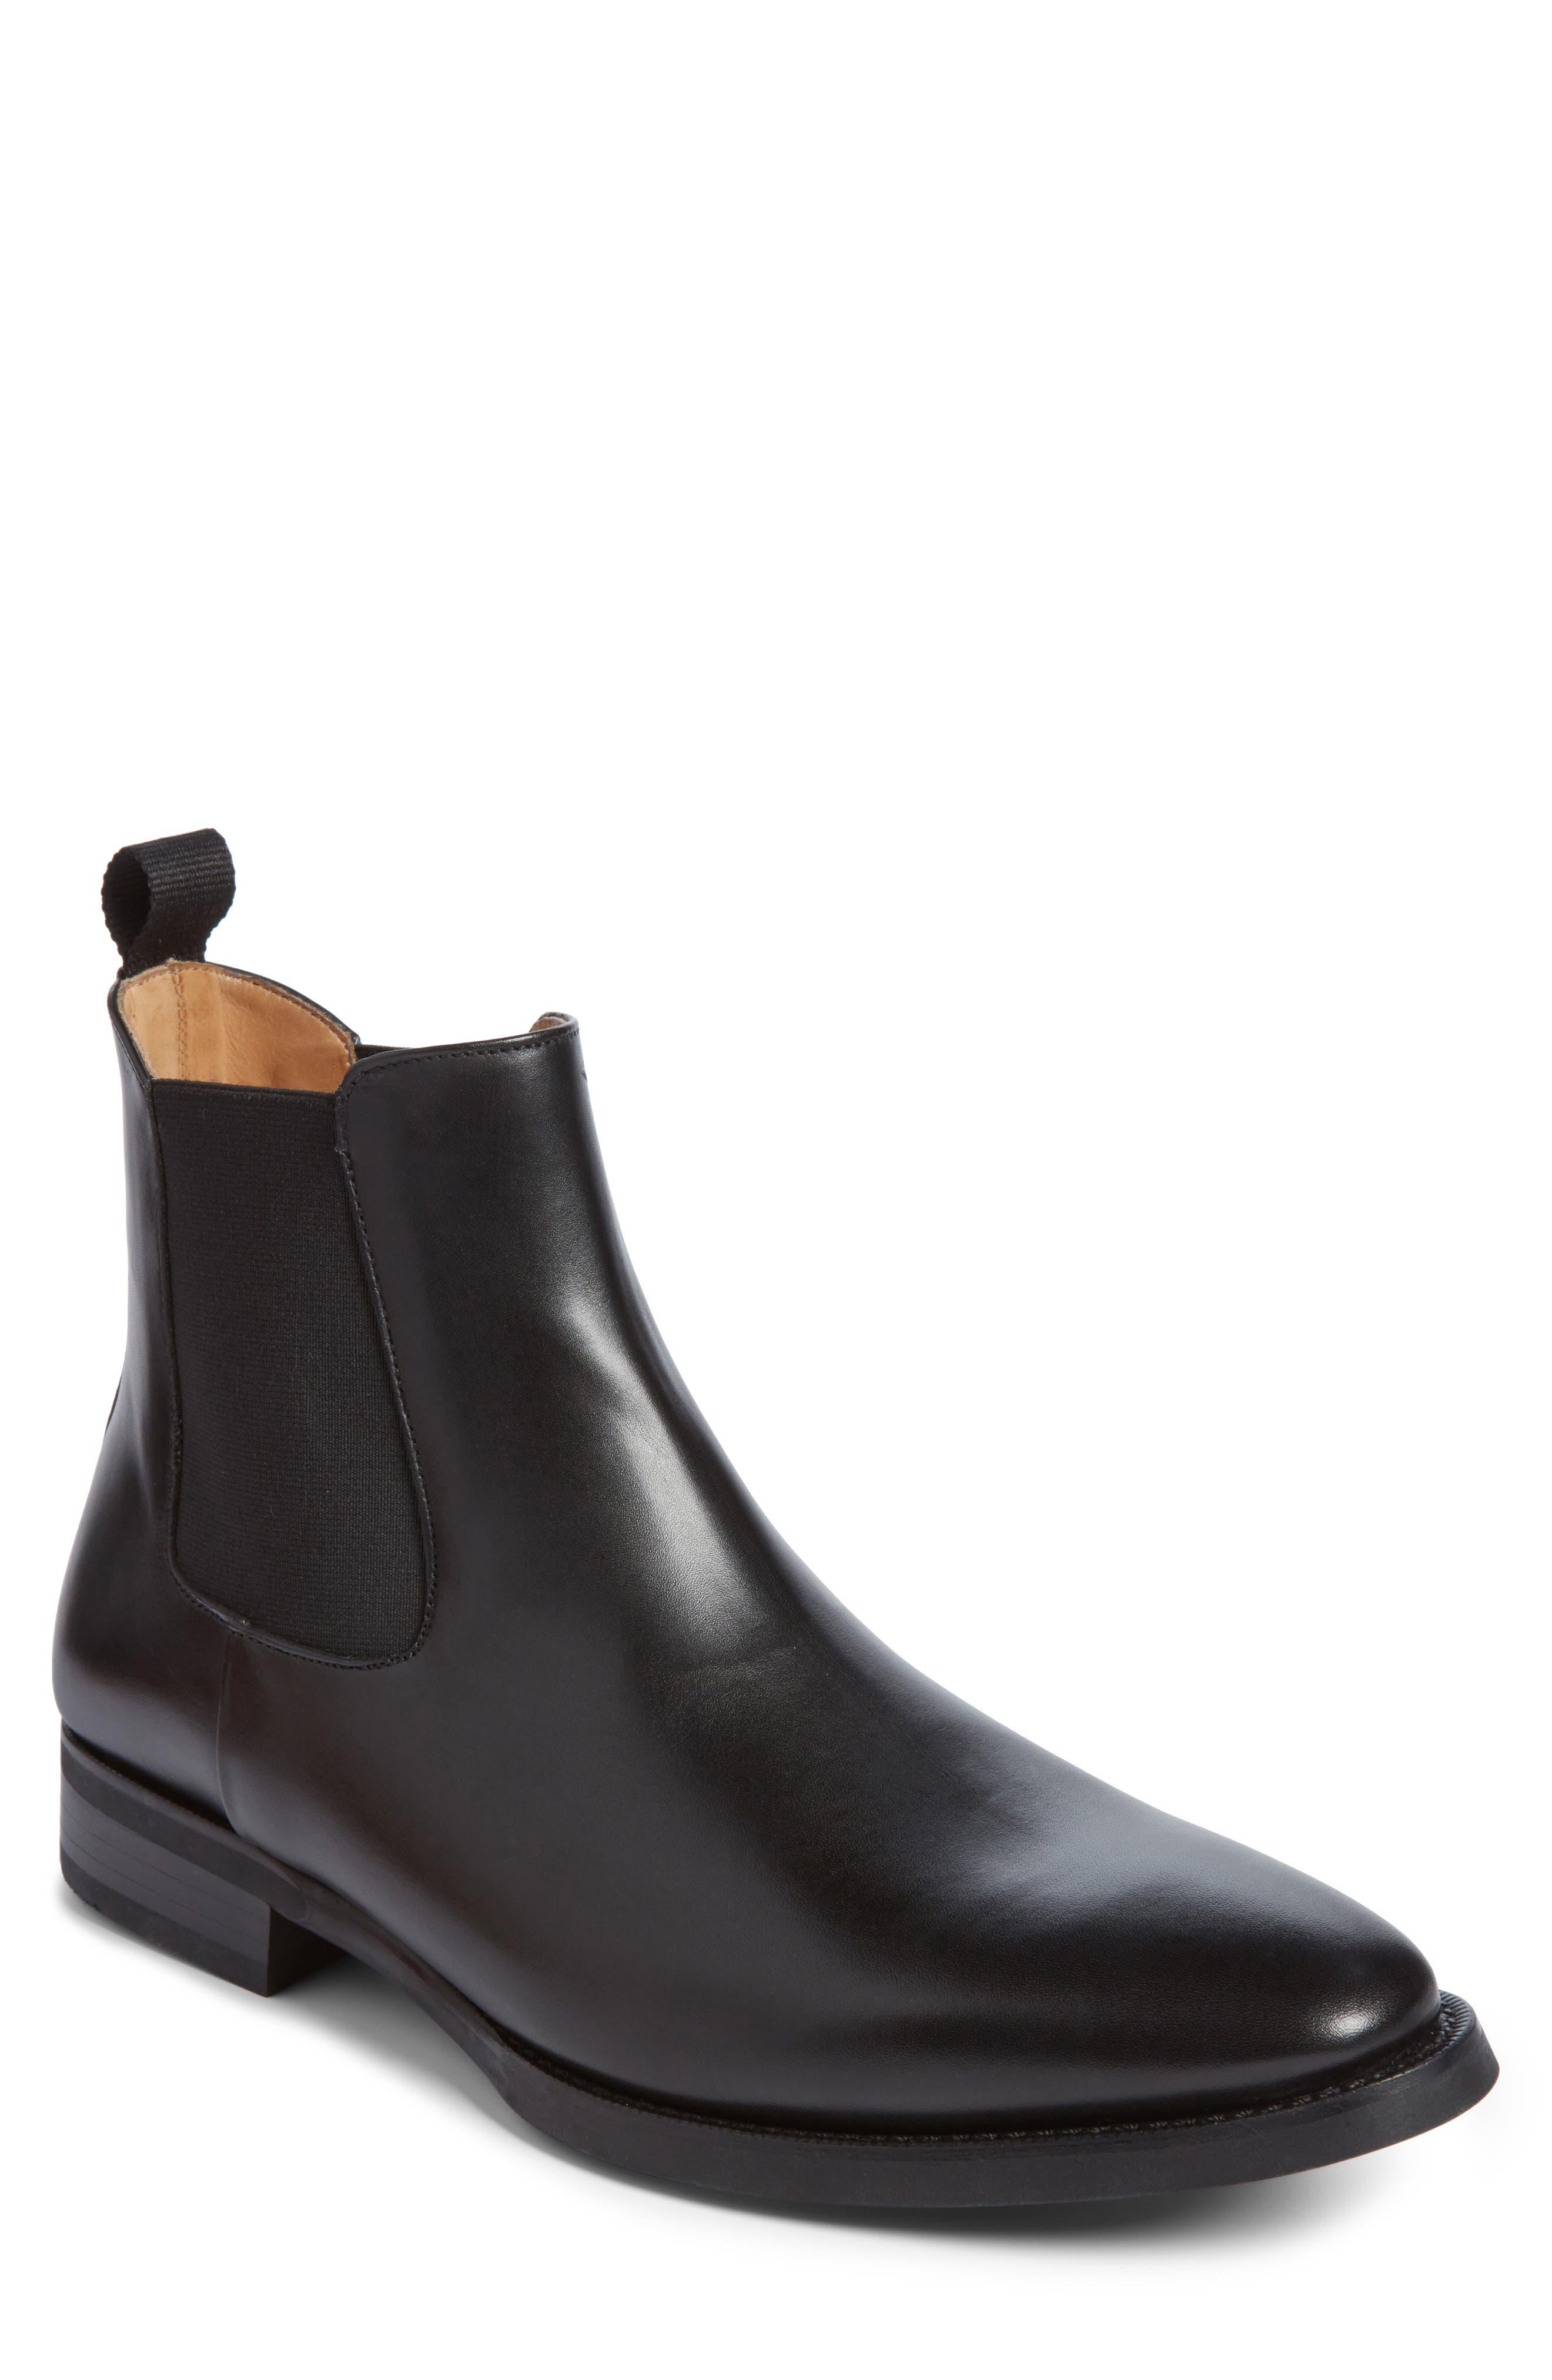 JACK ERWIN Ellis Water Resistant Chelsea Boot, Main, color, BLACK LEATHER